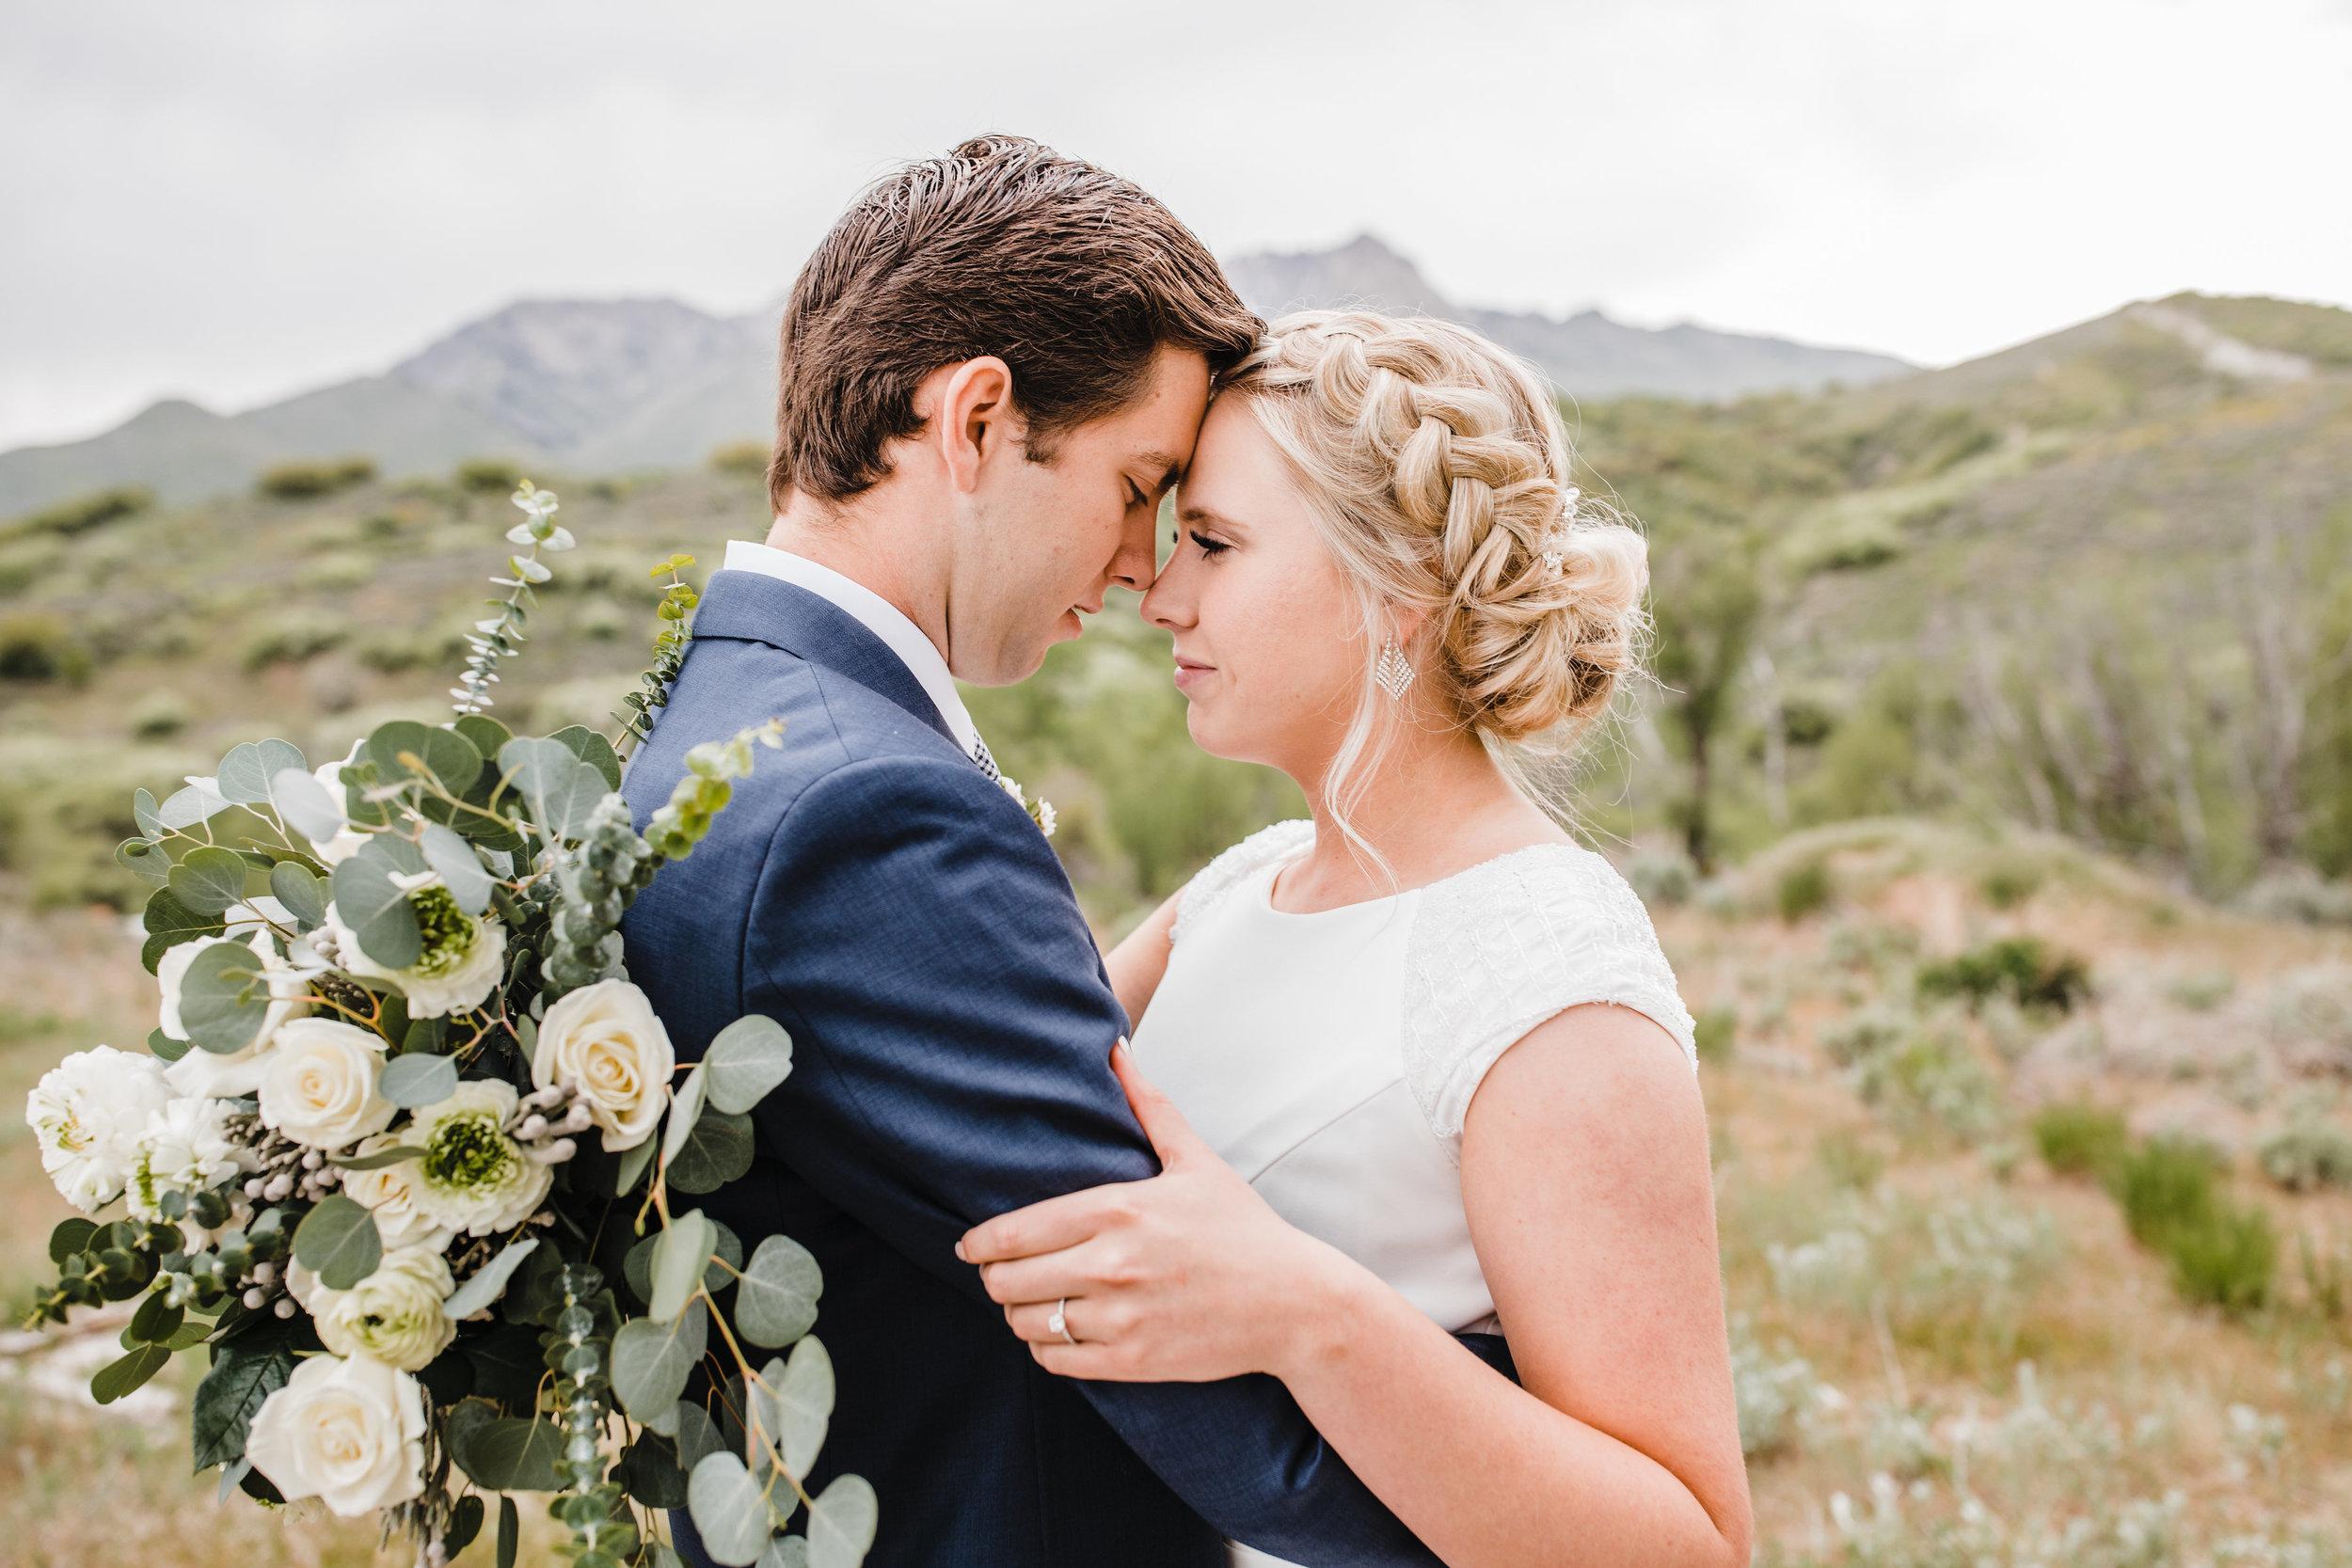 professional wedding photographer in park city utah mountain background modest wedding dress wedding hair bohemian flower bouquet